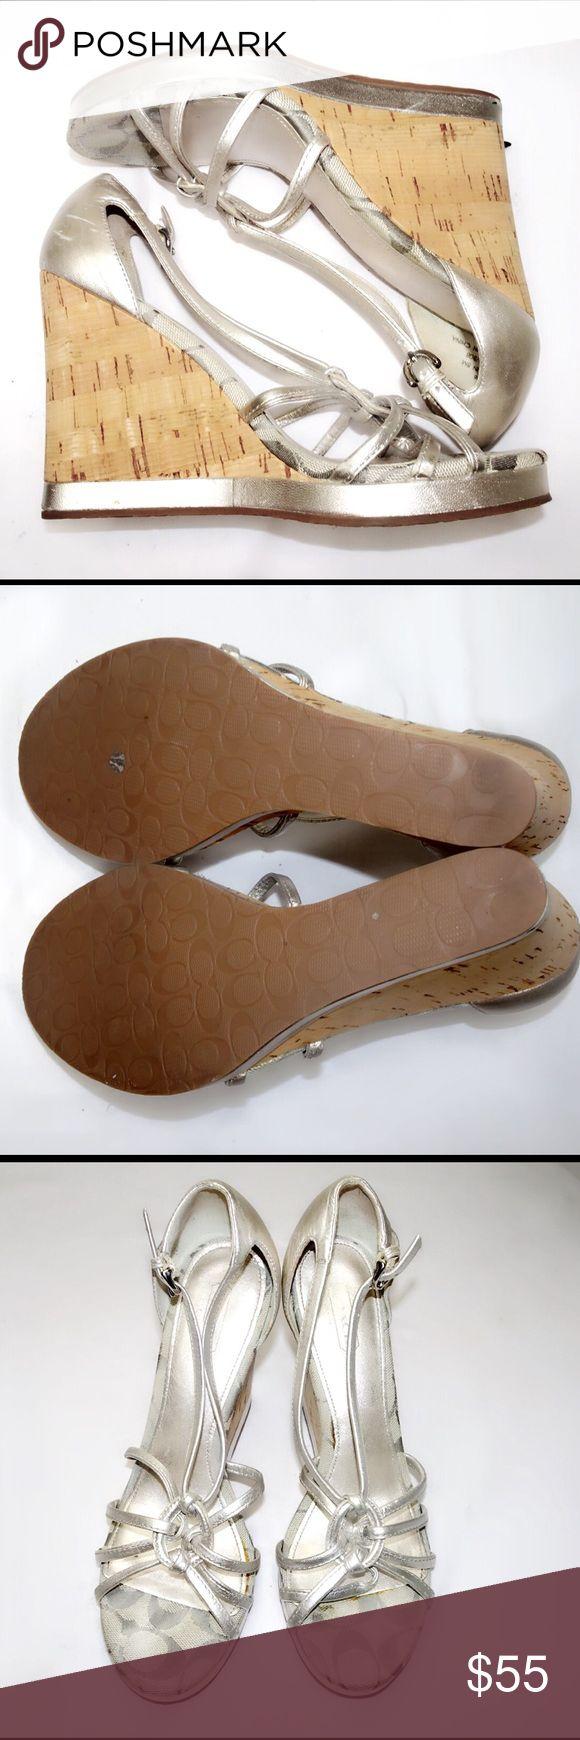 Coach Monogram Silver Wedge Sandals Coach Monogram Silver Wedge Sandals. Only wore a few times Coach Shoes Wedges